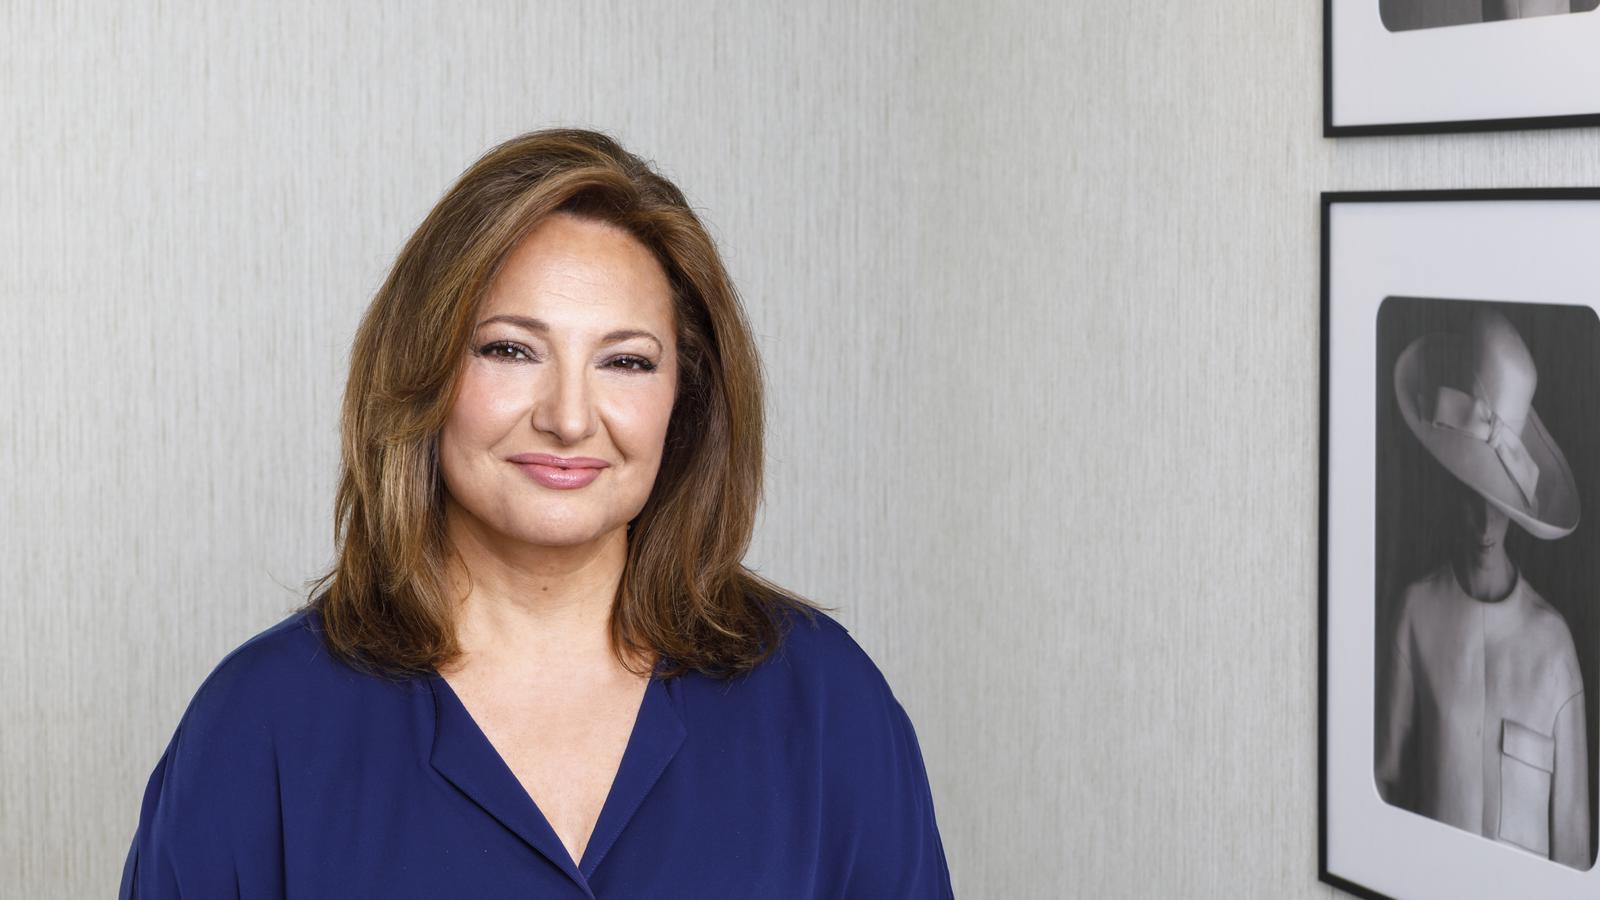 Marta Álvarez serà la nova presidenta no executiva d'El Corte Inglés